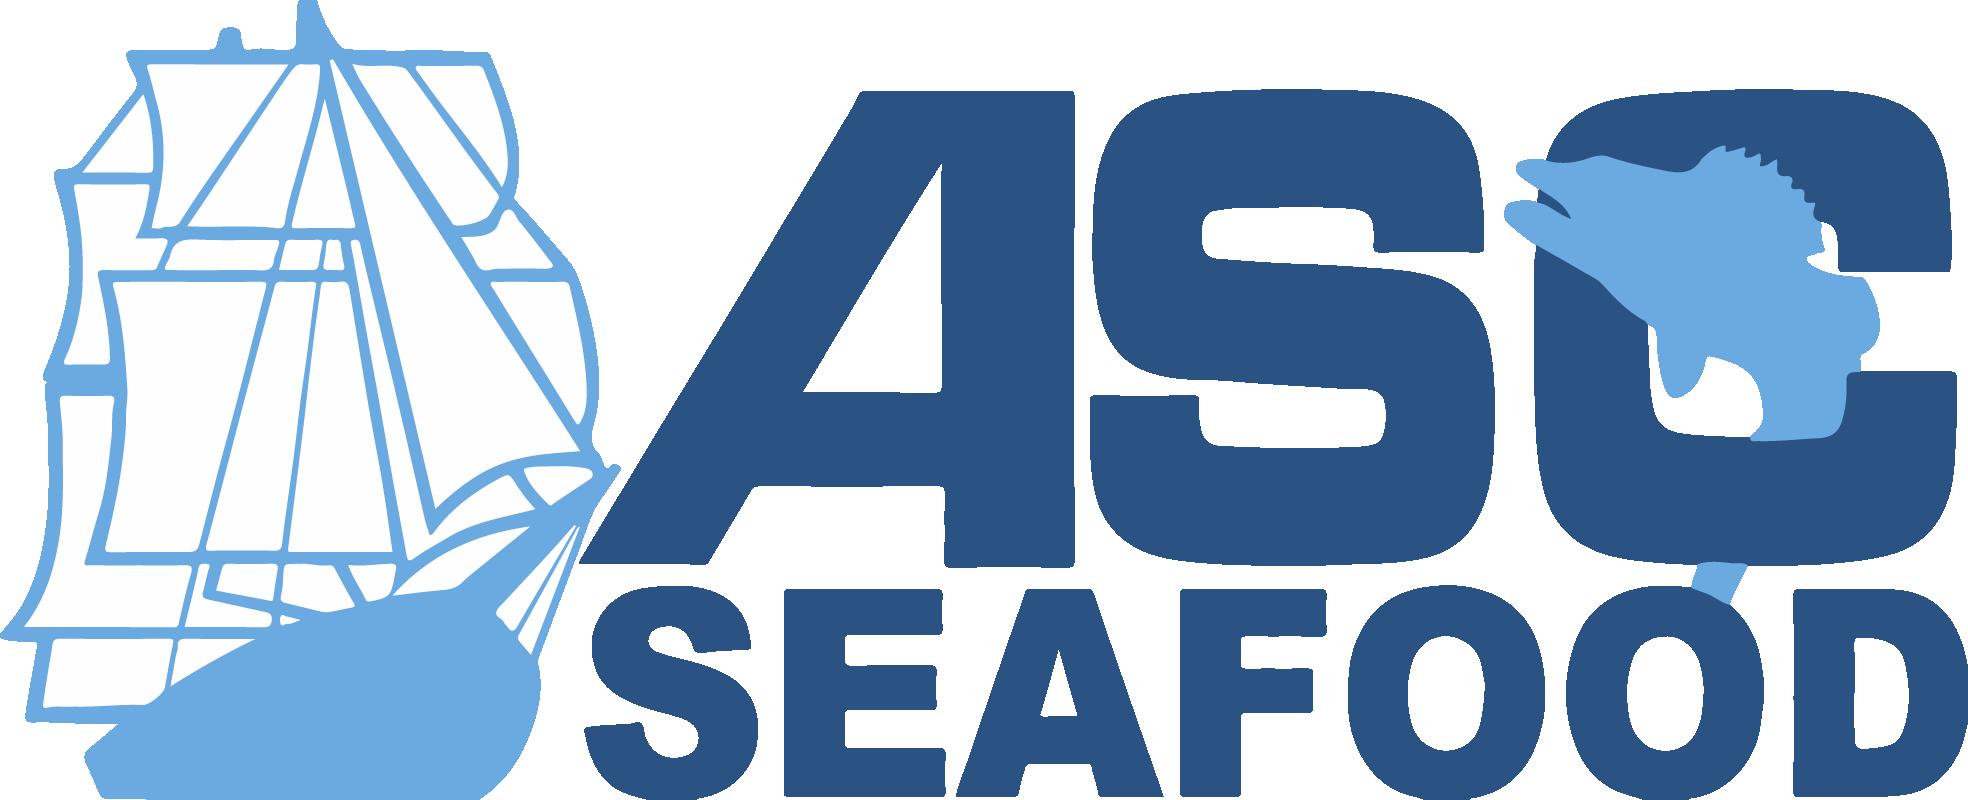 ASC Seafood